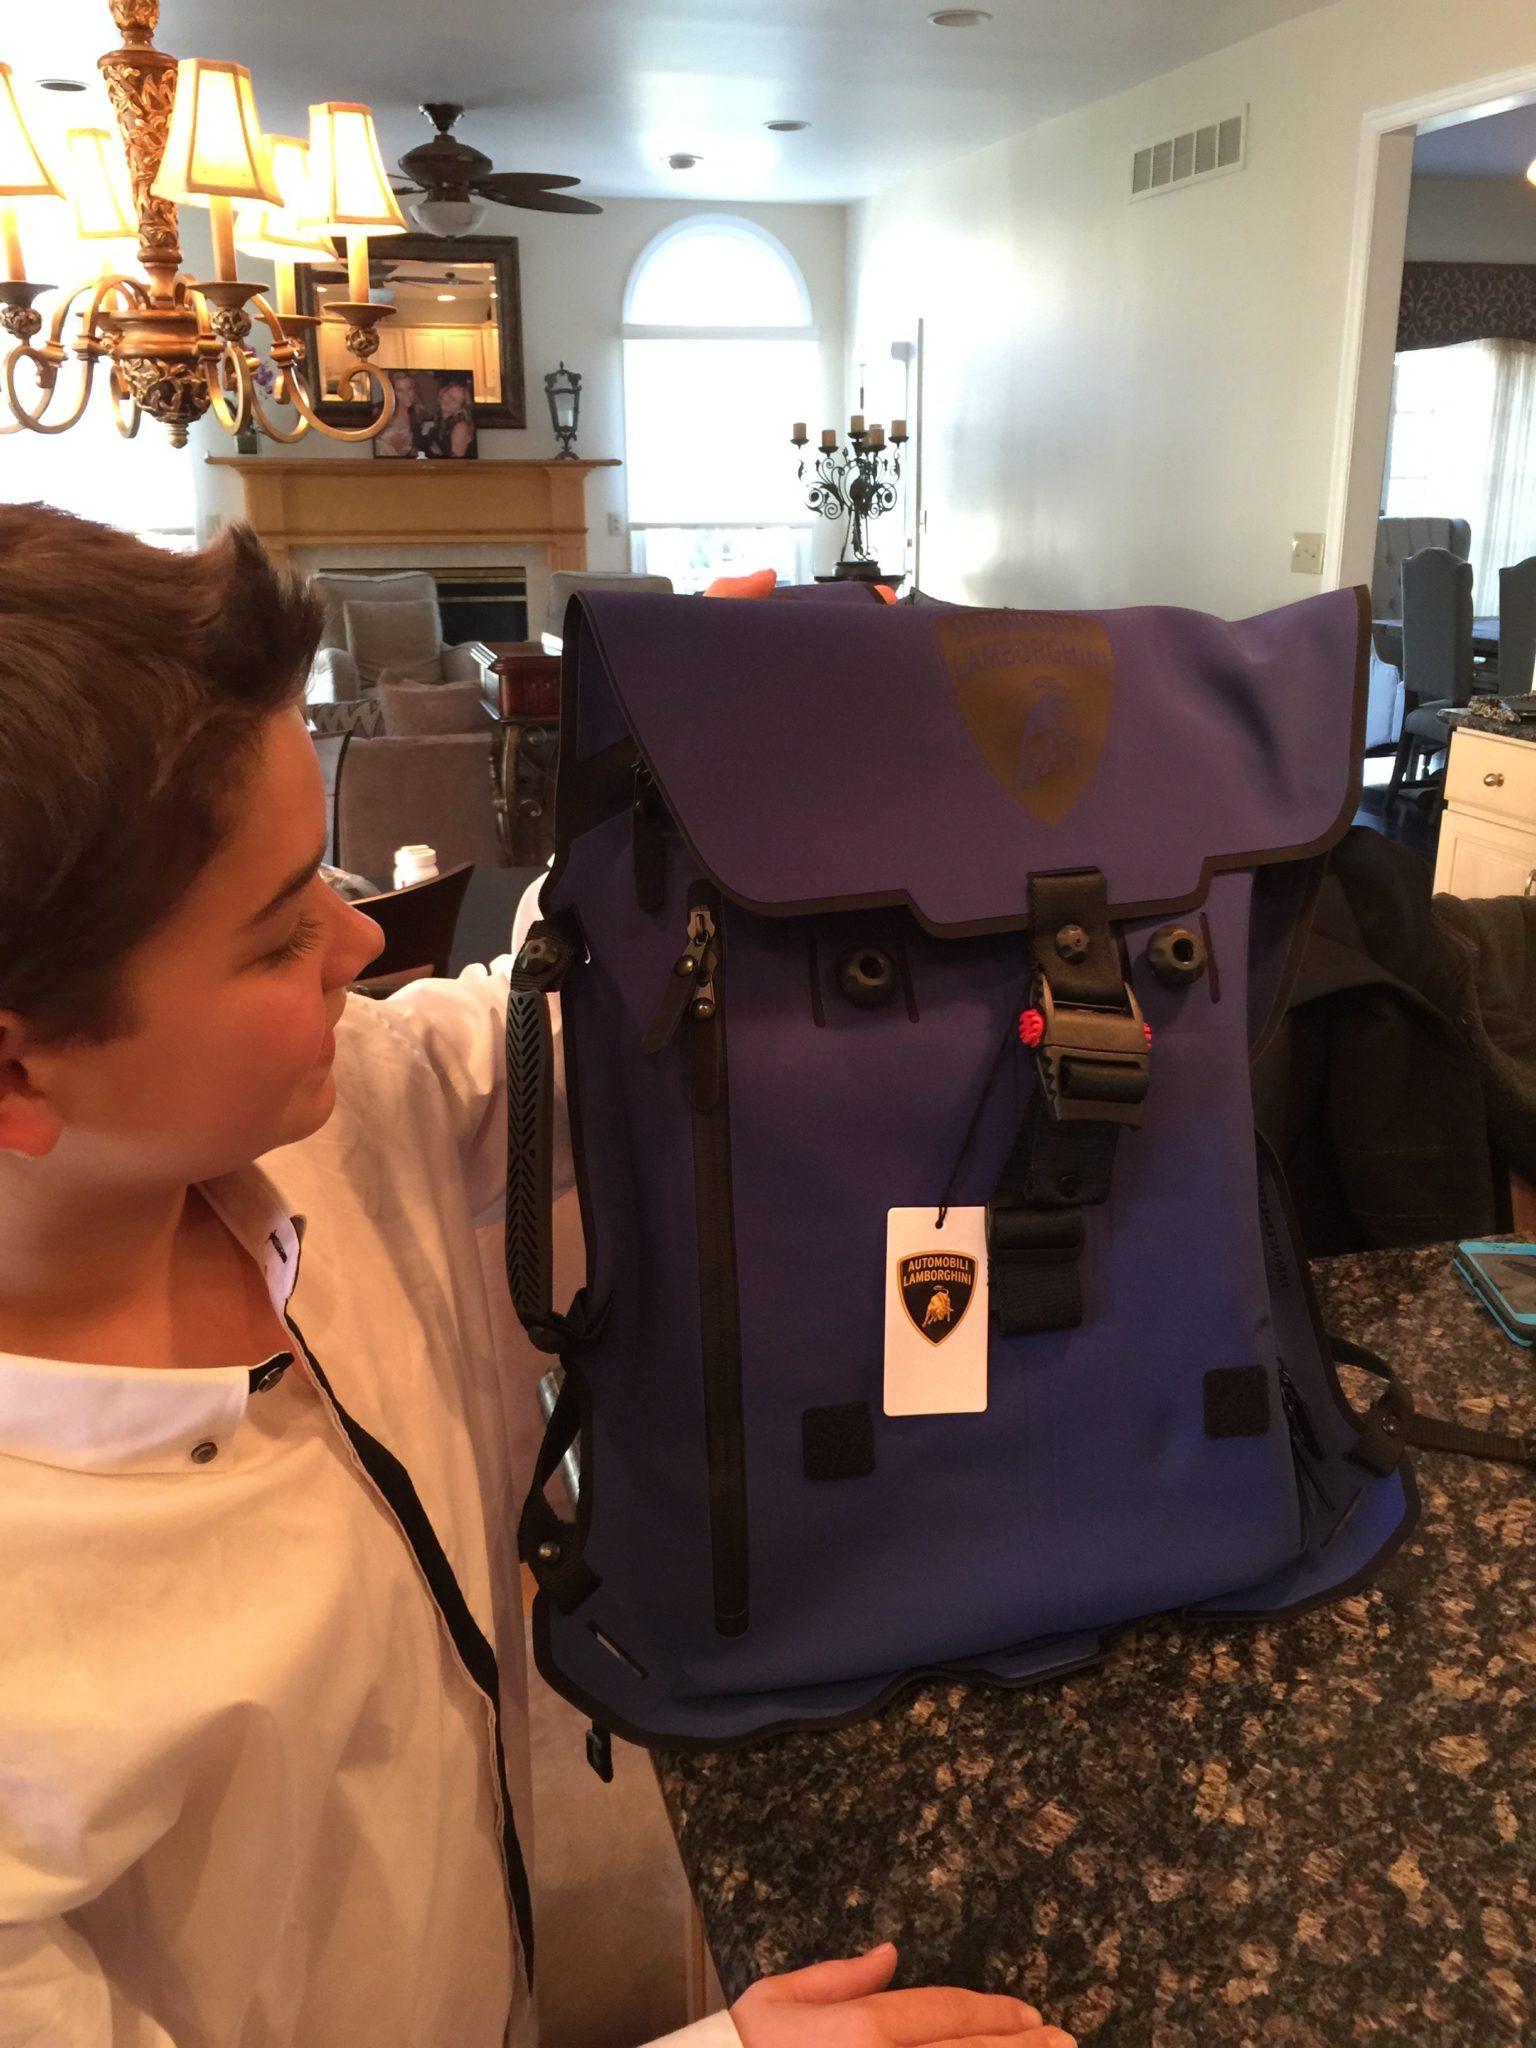 My New Lamborghini Backpack